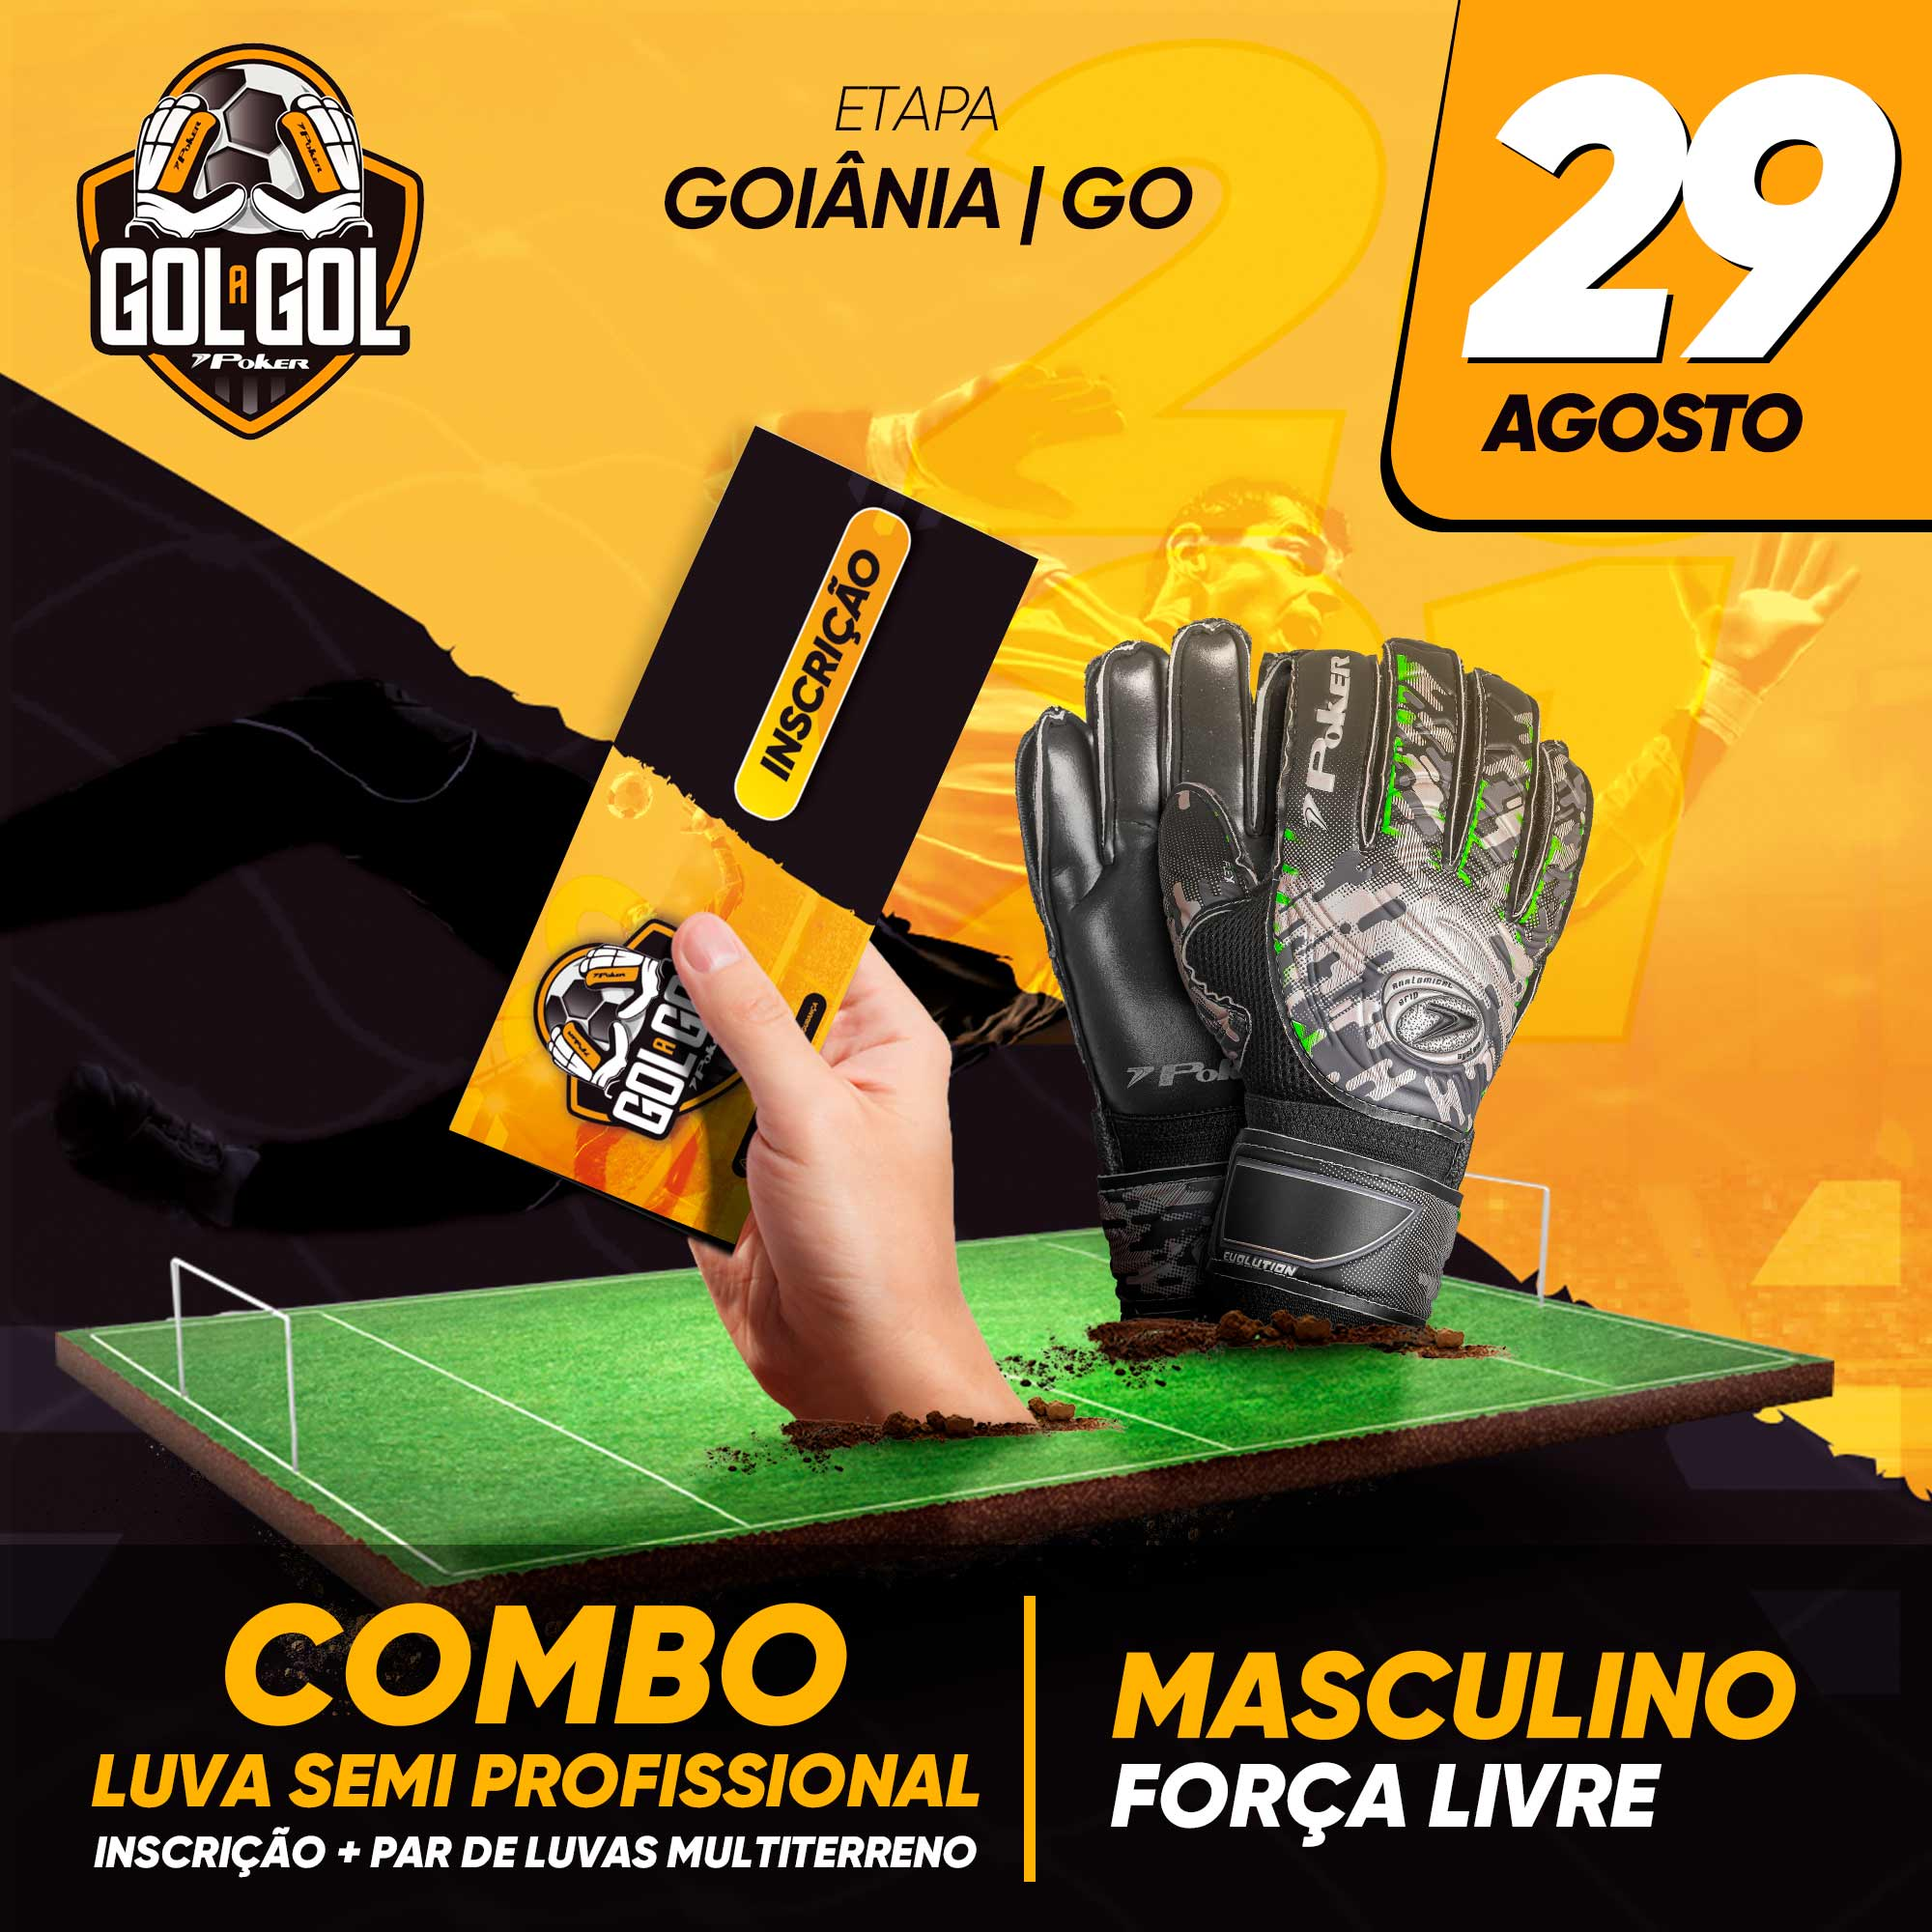 Combo Luva Semi-Profissional –  Gol a Gol Goiânia/GO – 29/08/2021